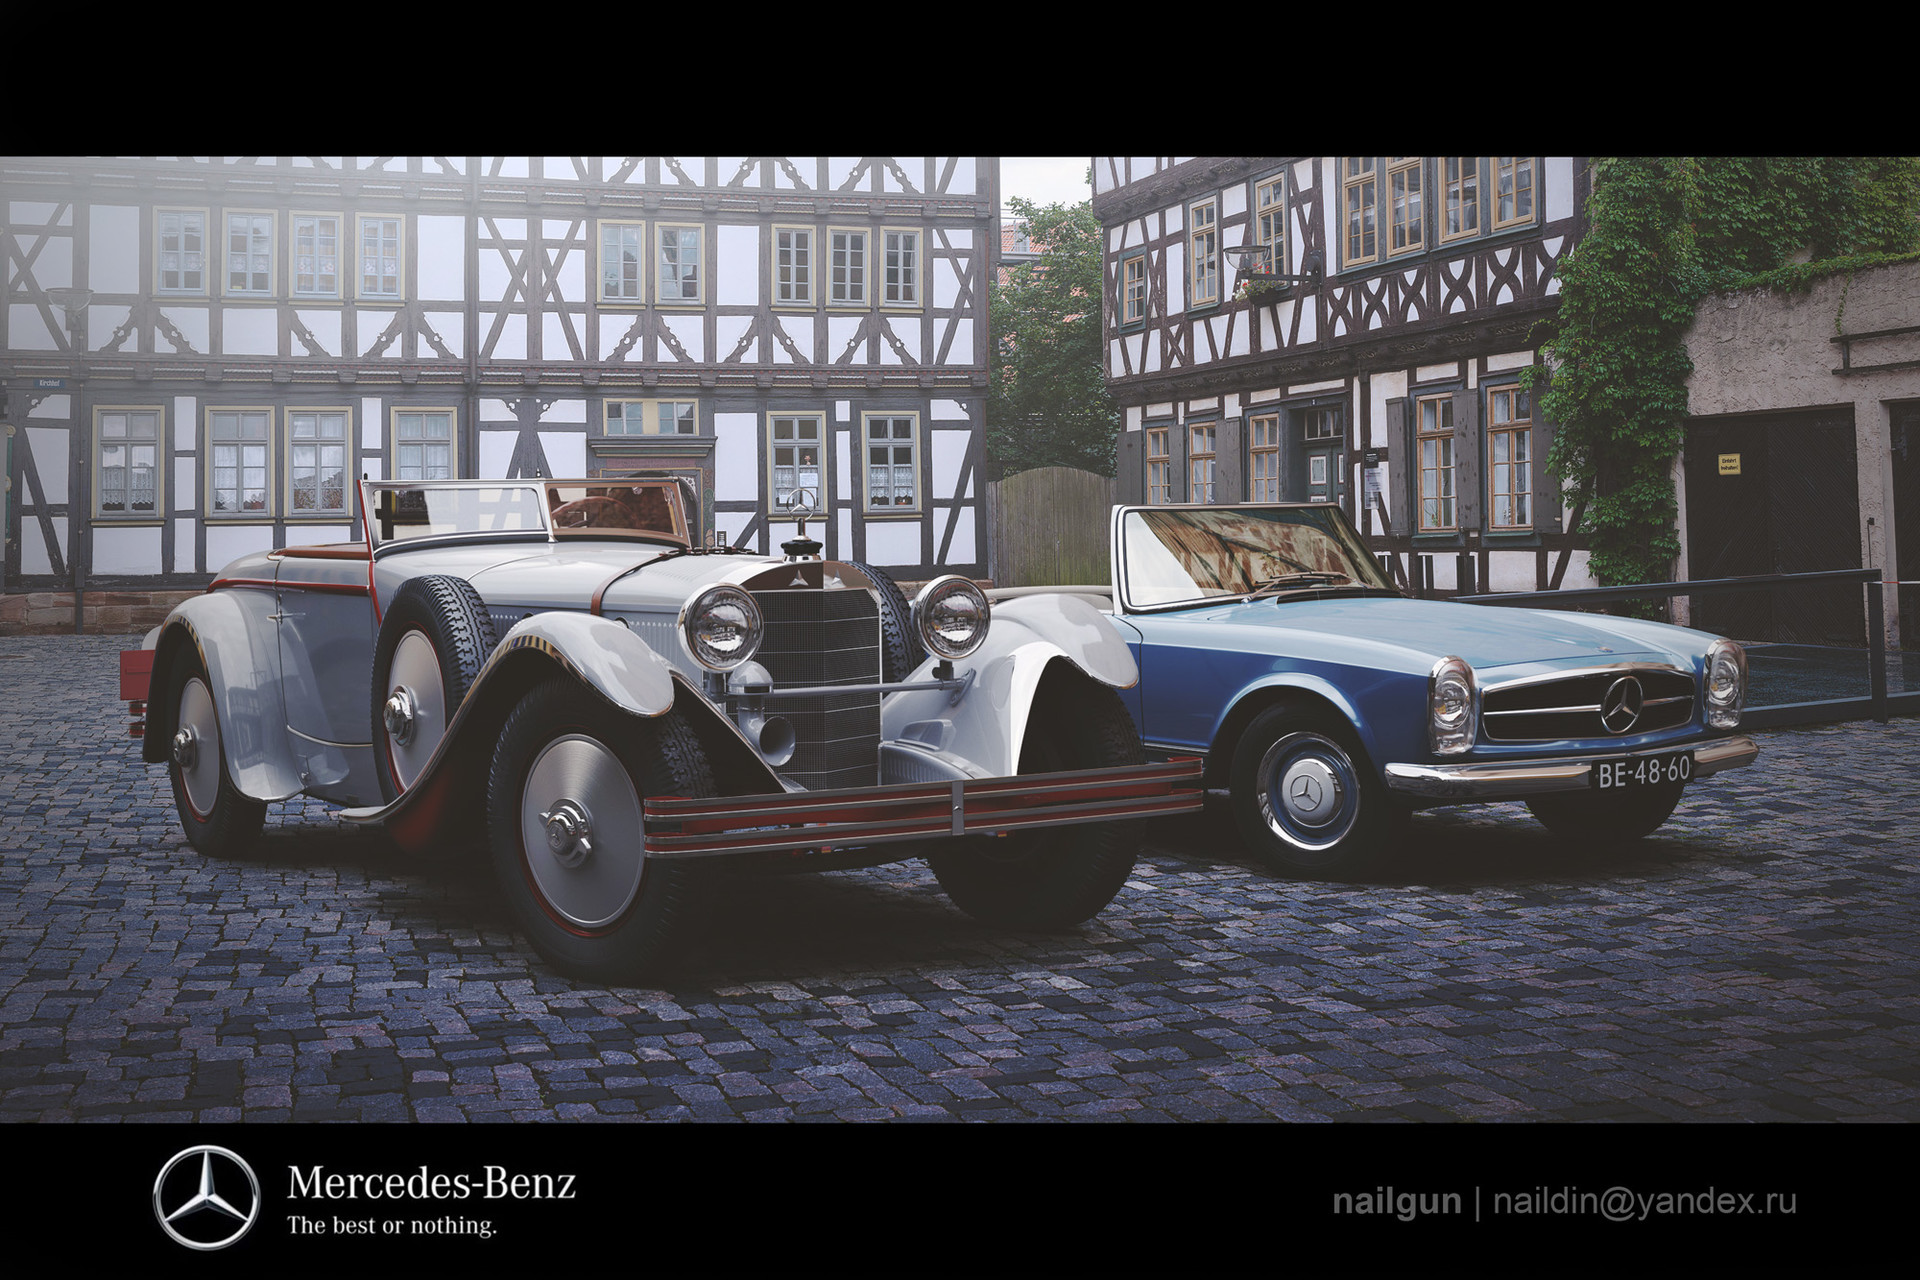 Nail khusnutdinov sk 111 mercedes benz 680s germany duo post